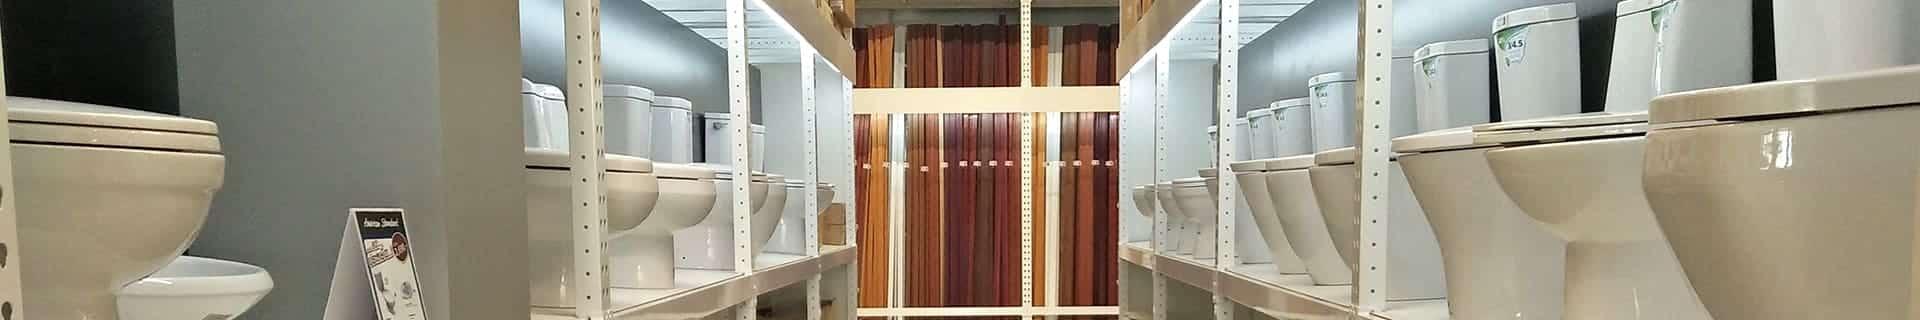 Sanitary display shelves cover